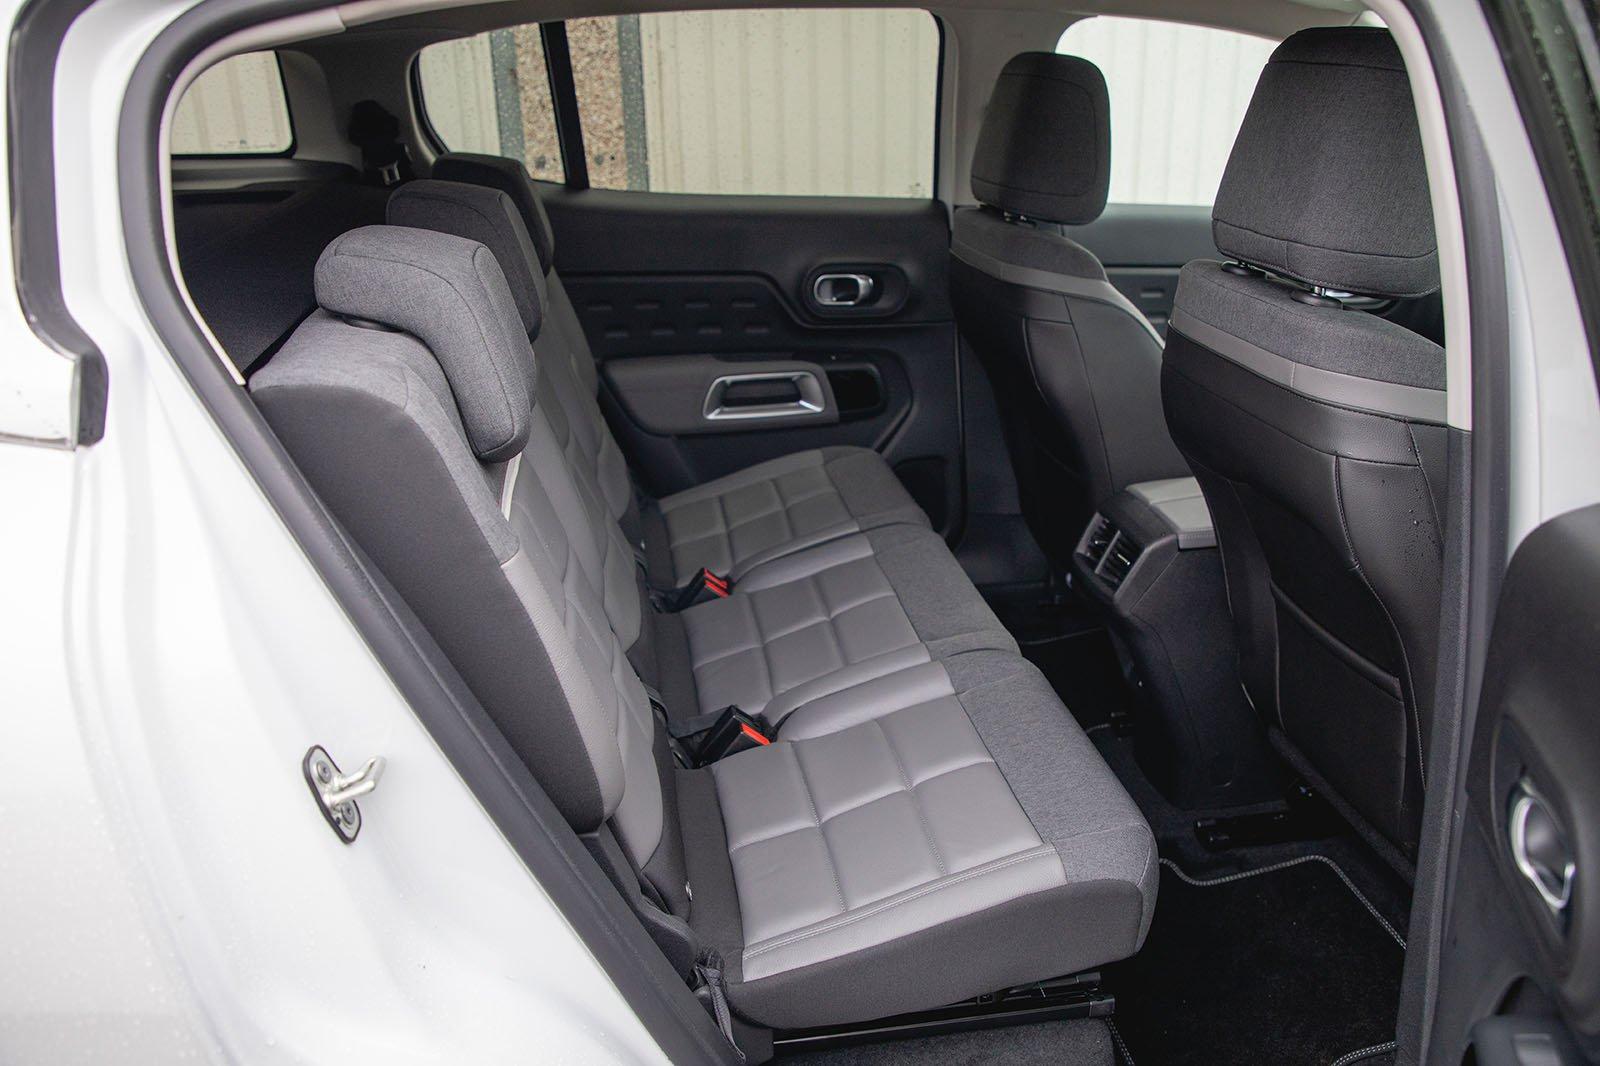 Citroën C5 Aircross 2020 rear seats